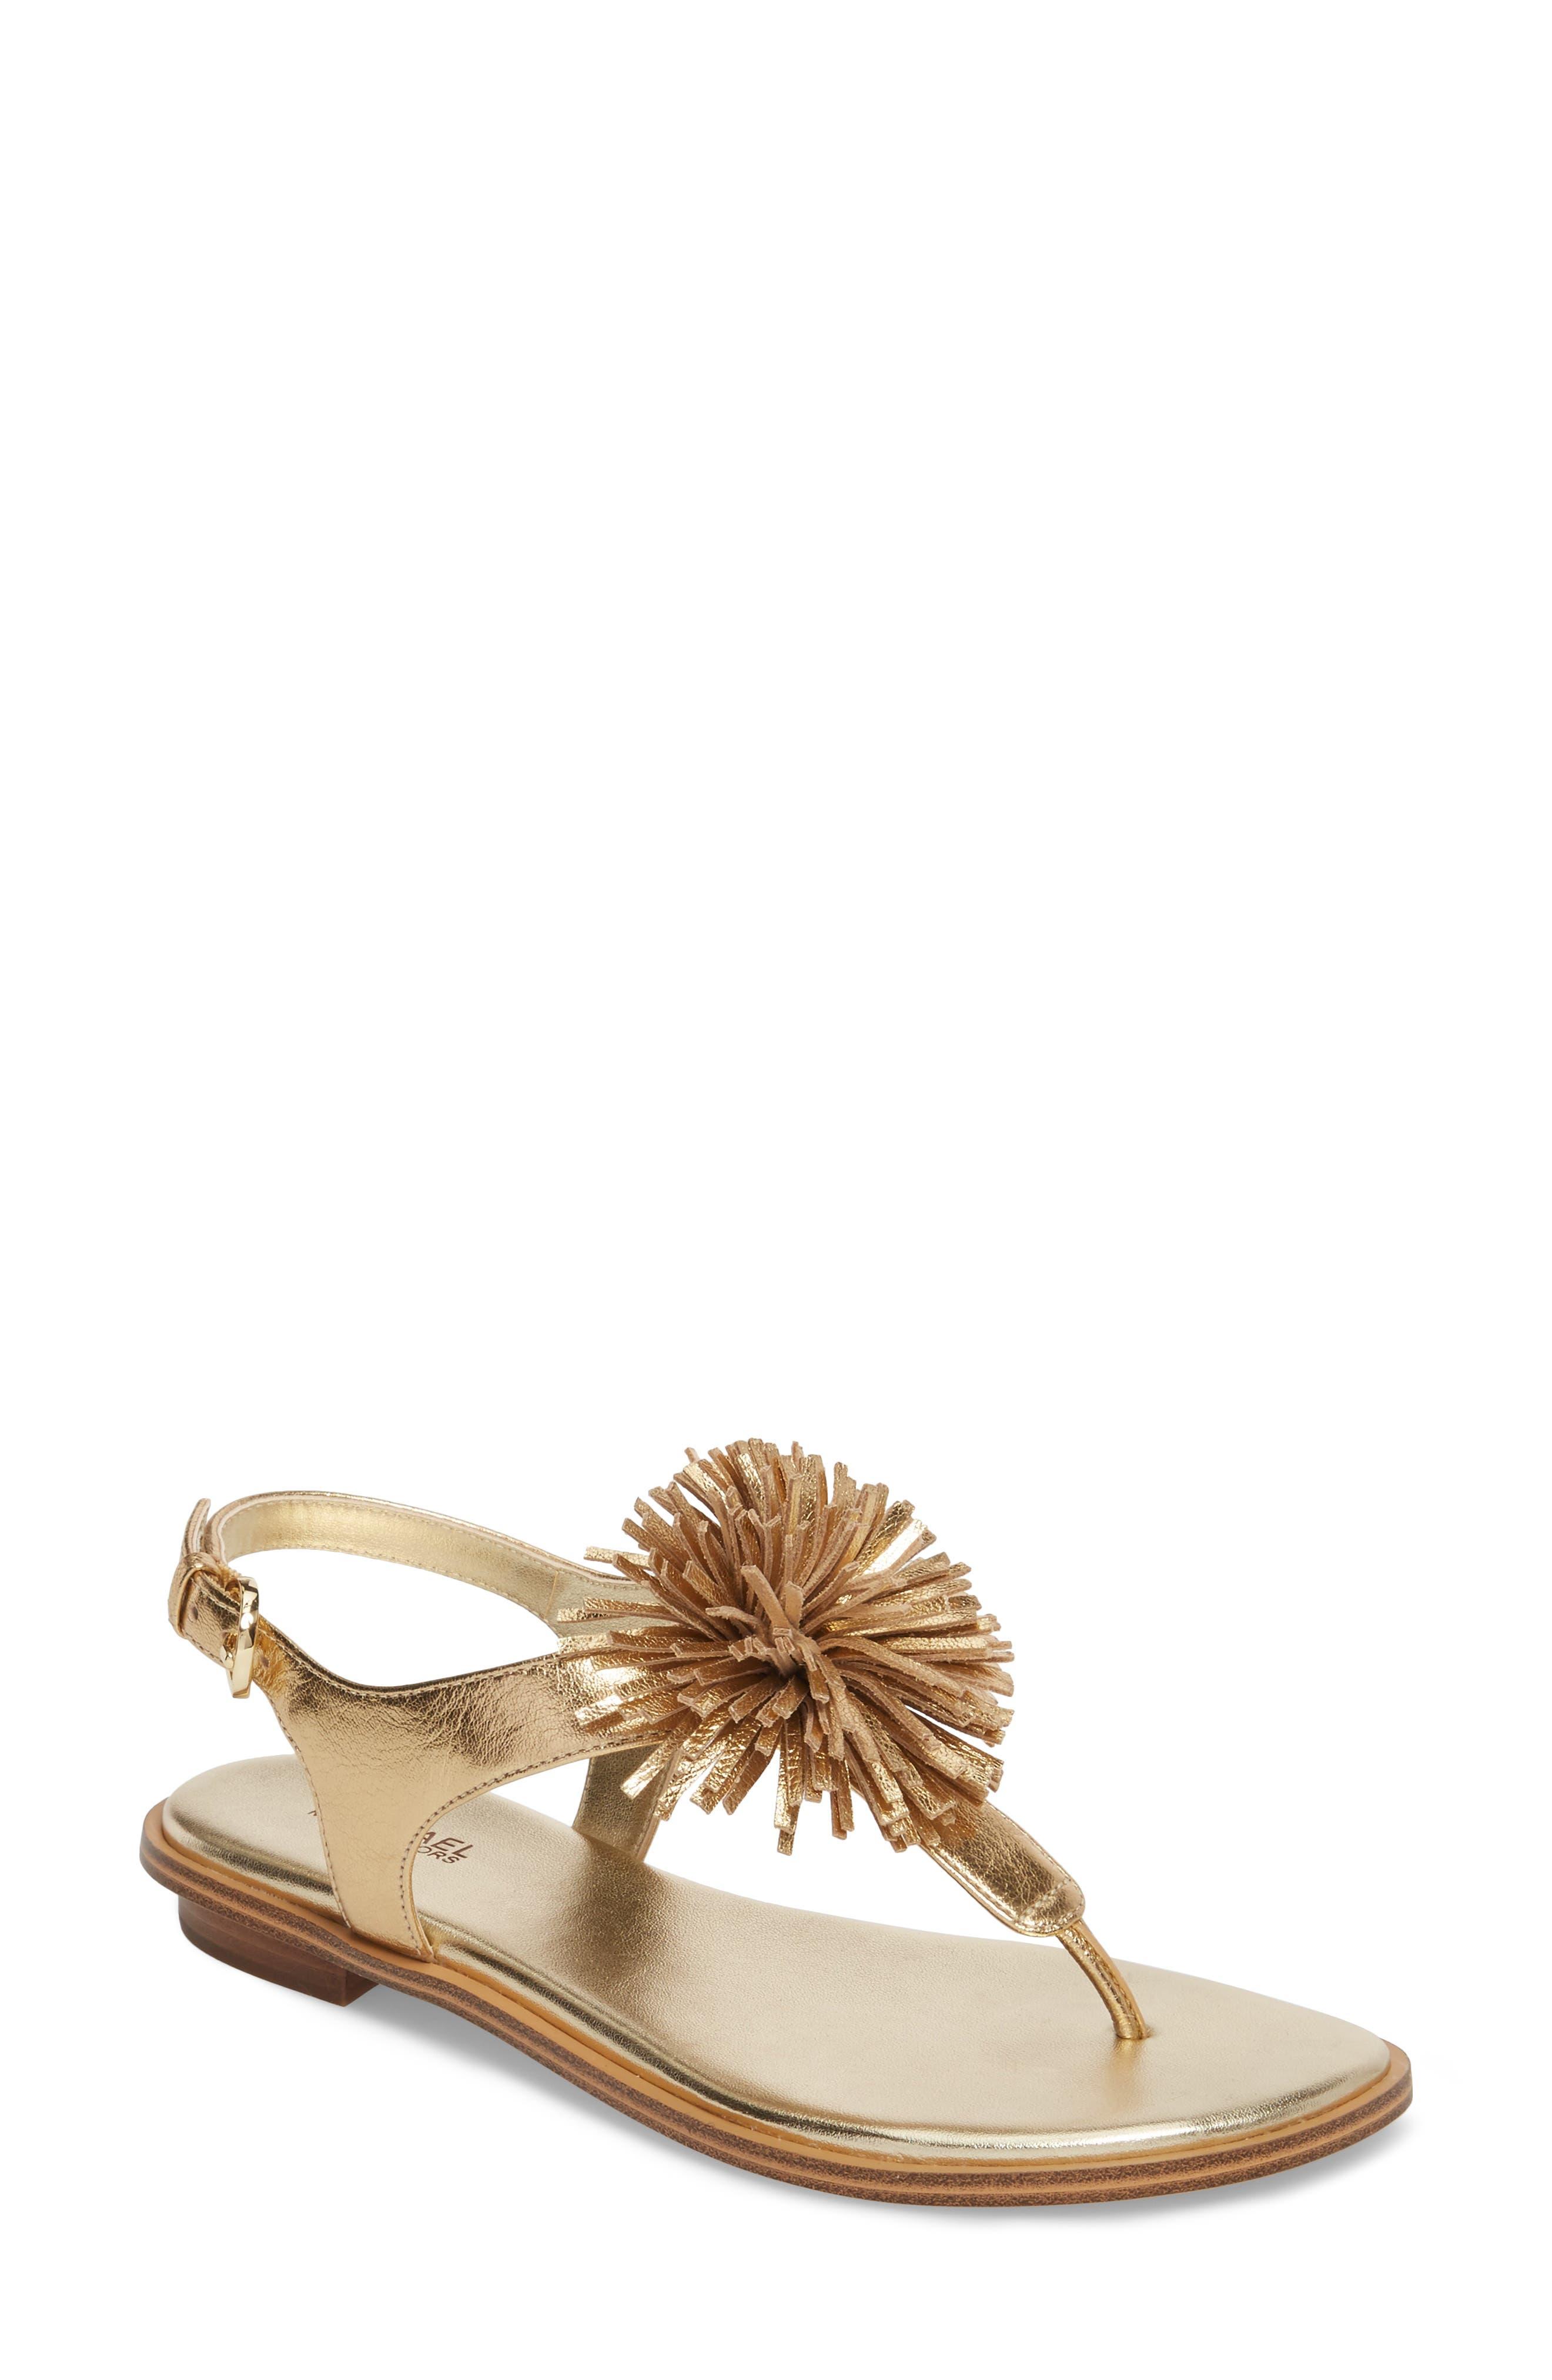 Lolita Sandal,                         Main,                         color, Pale Gold Leather